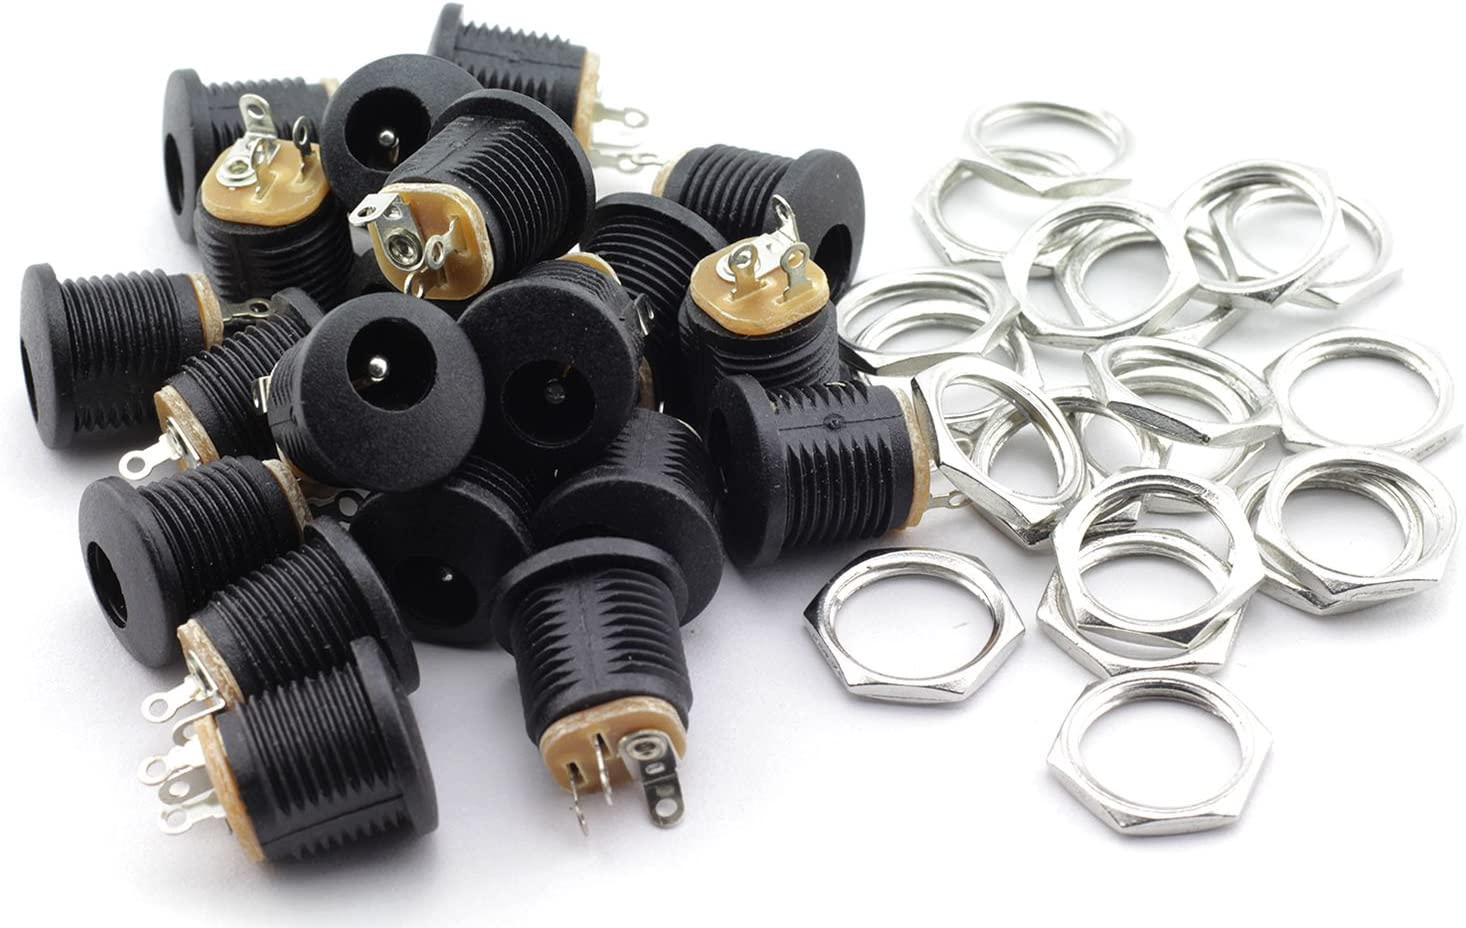 TOTOT 20 Pack 5.5mm x 2.1mm 3 Pin Female DC Power Jack Panel Mount Screw Nut Kit DC Socket Electrical Plug